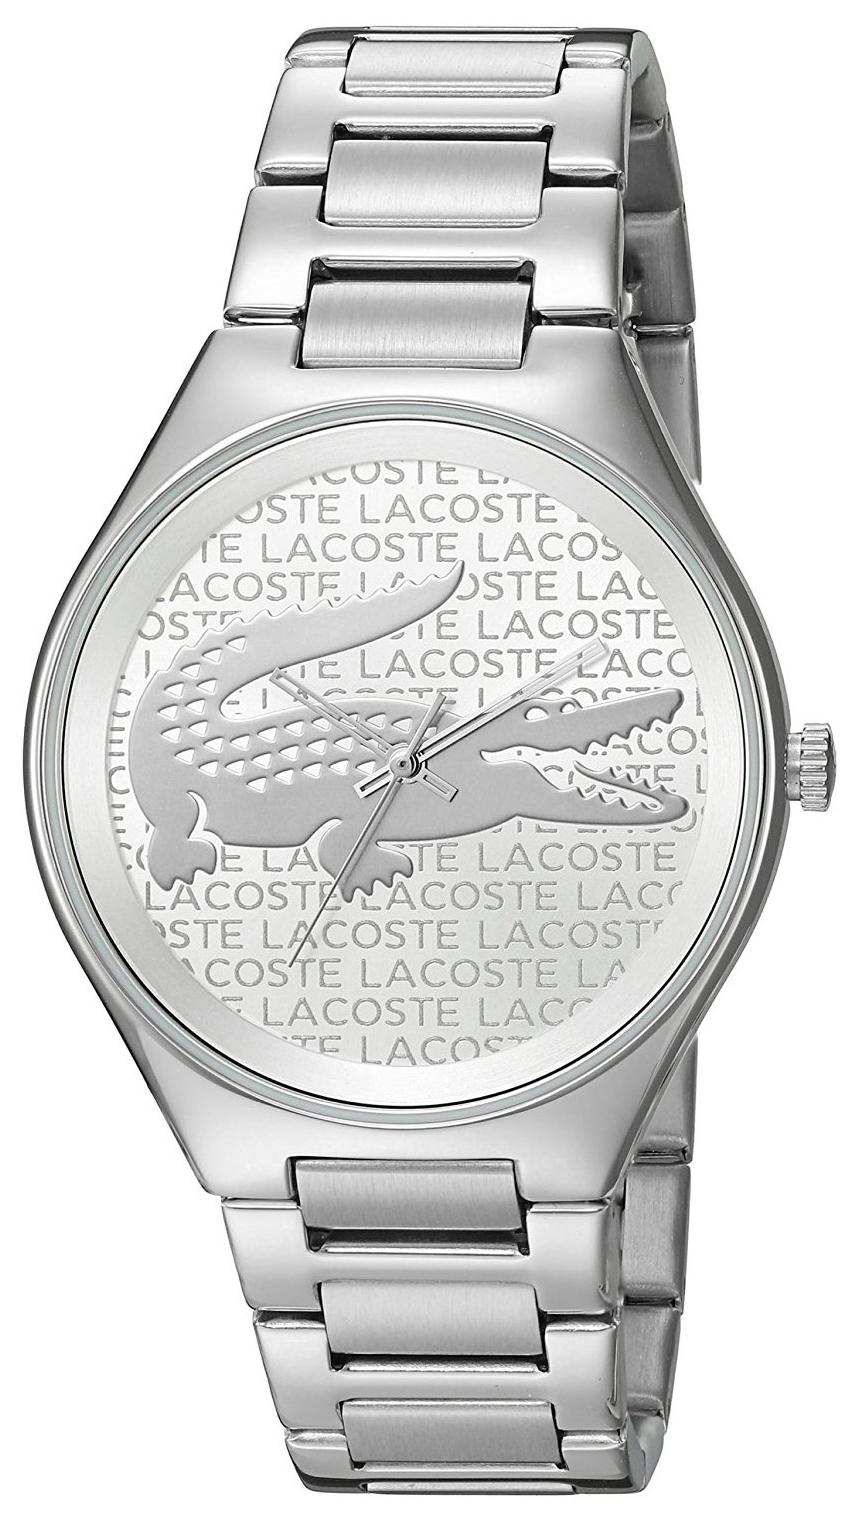 Lacoste Valencia Damklocka 2000931 Silverfärgad/Stål Ø38 mm - Lacoste